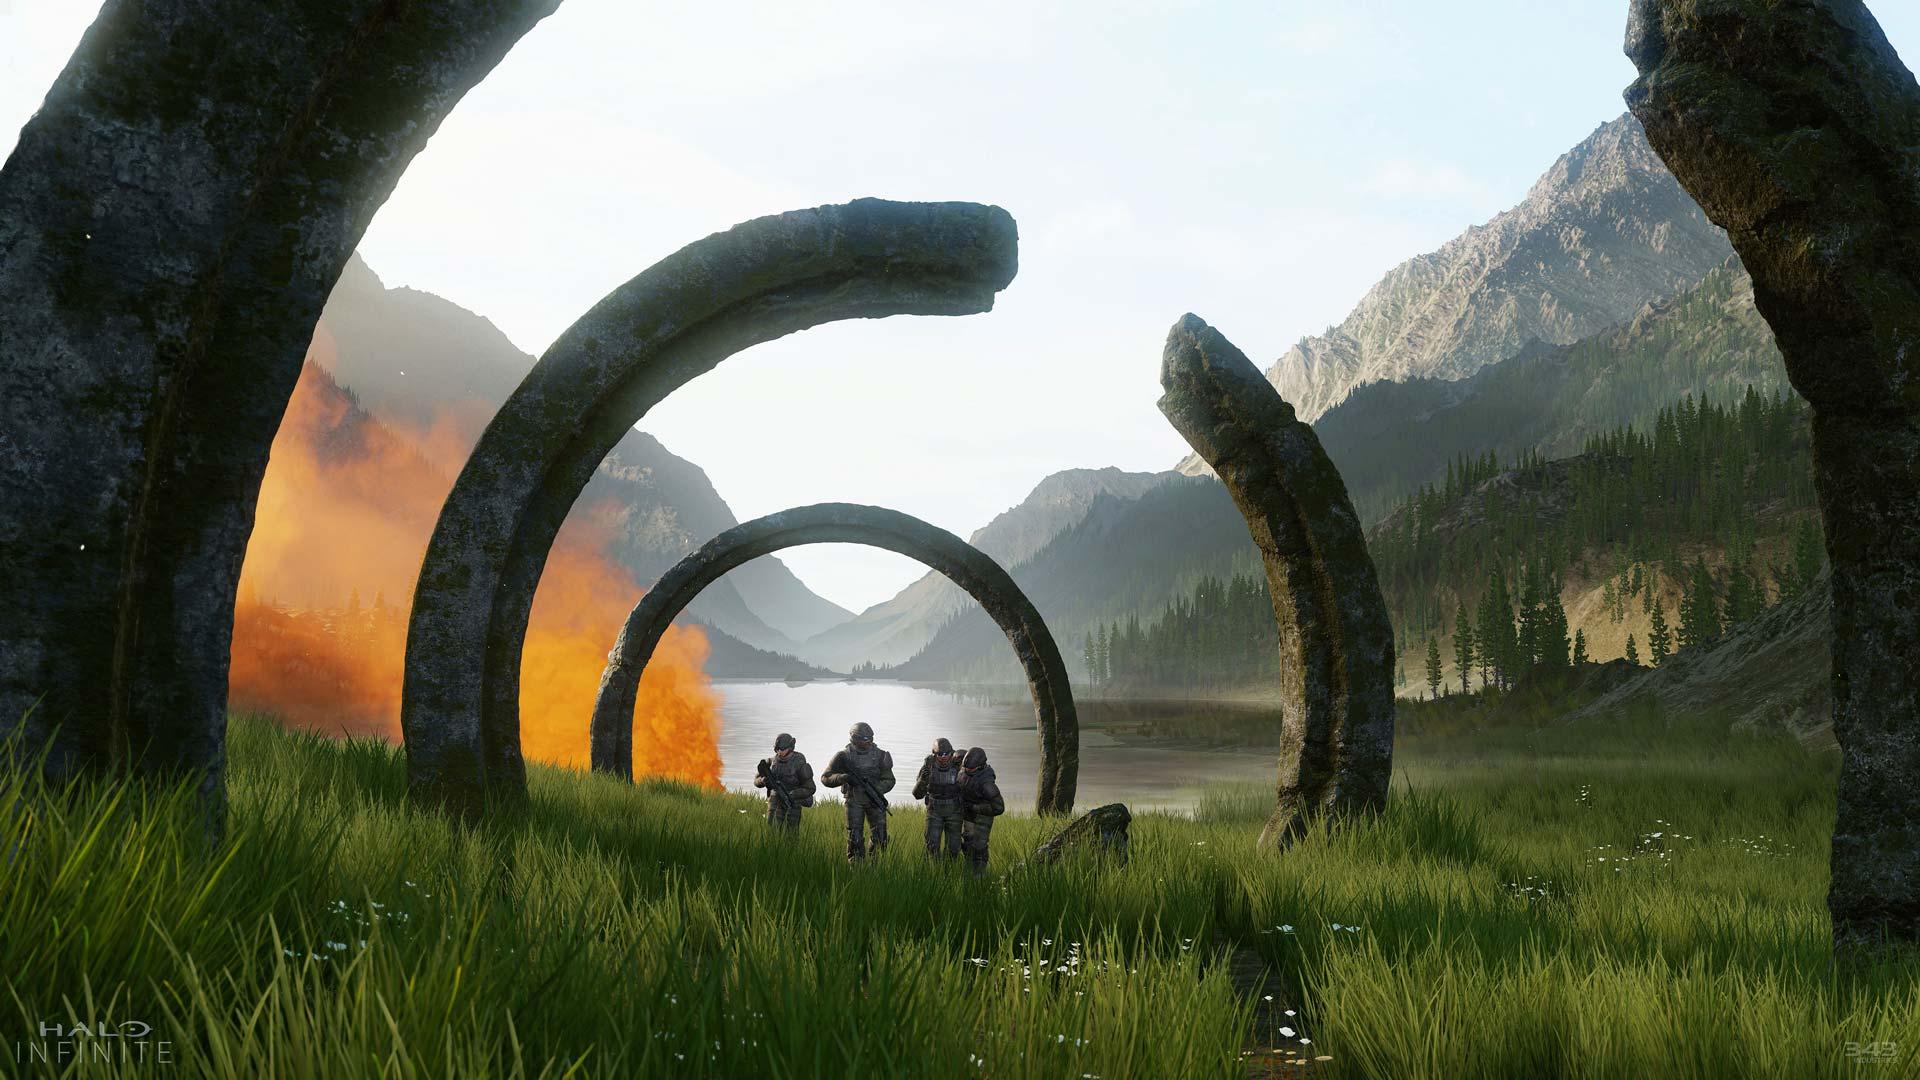 Halo Infinite is Halo 6